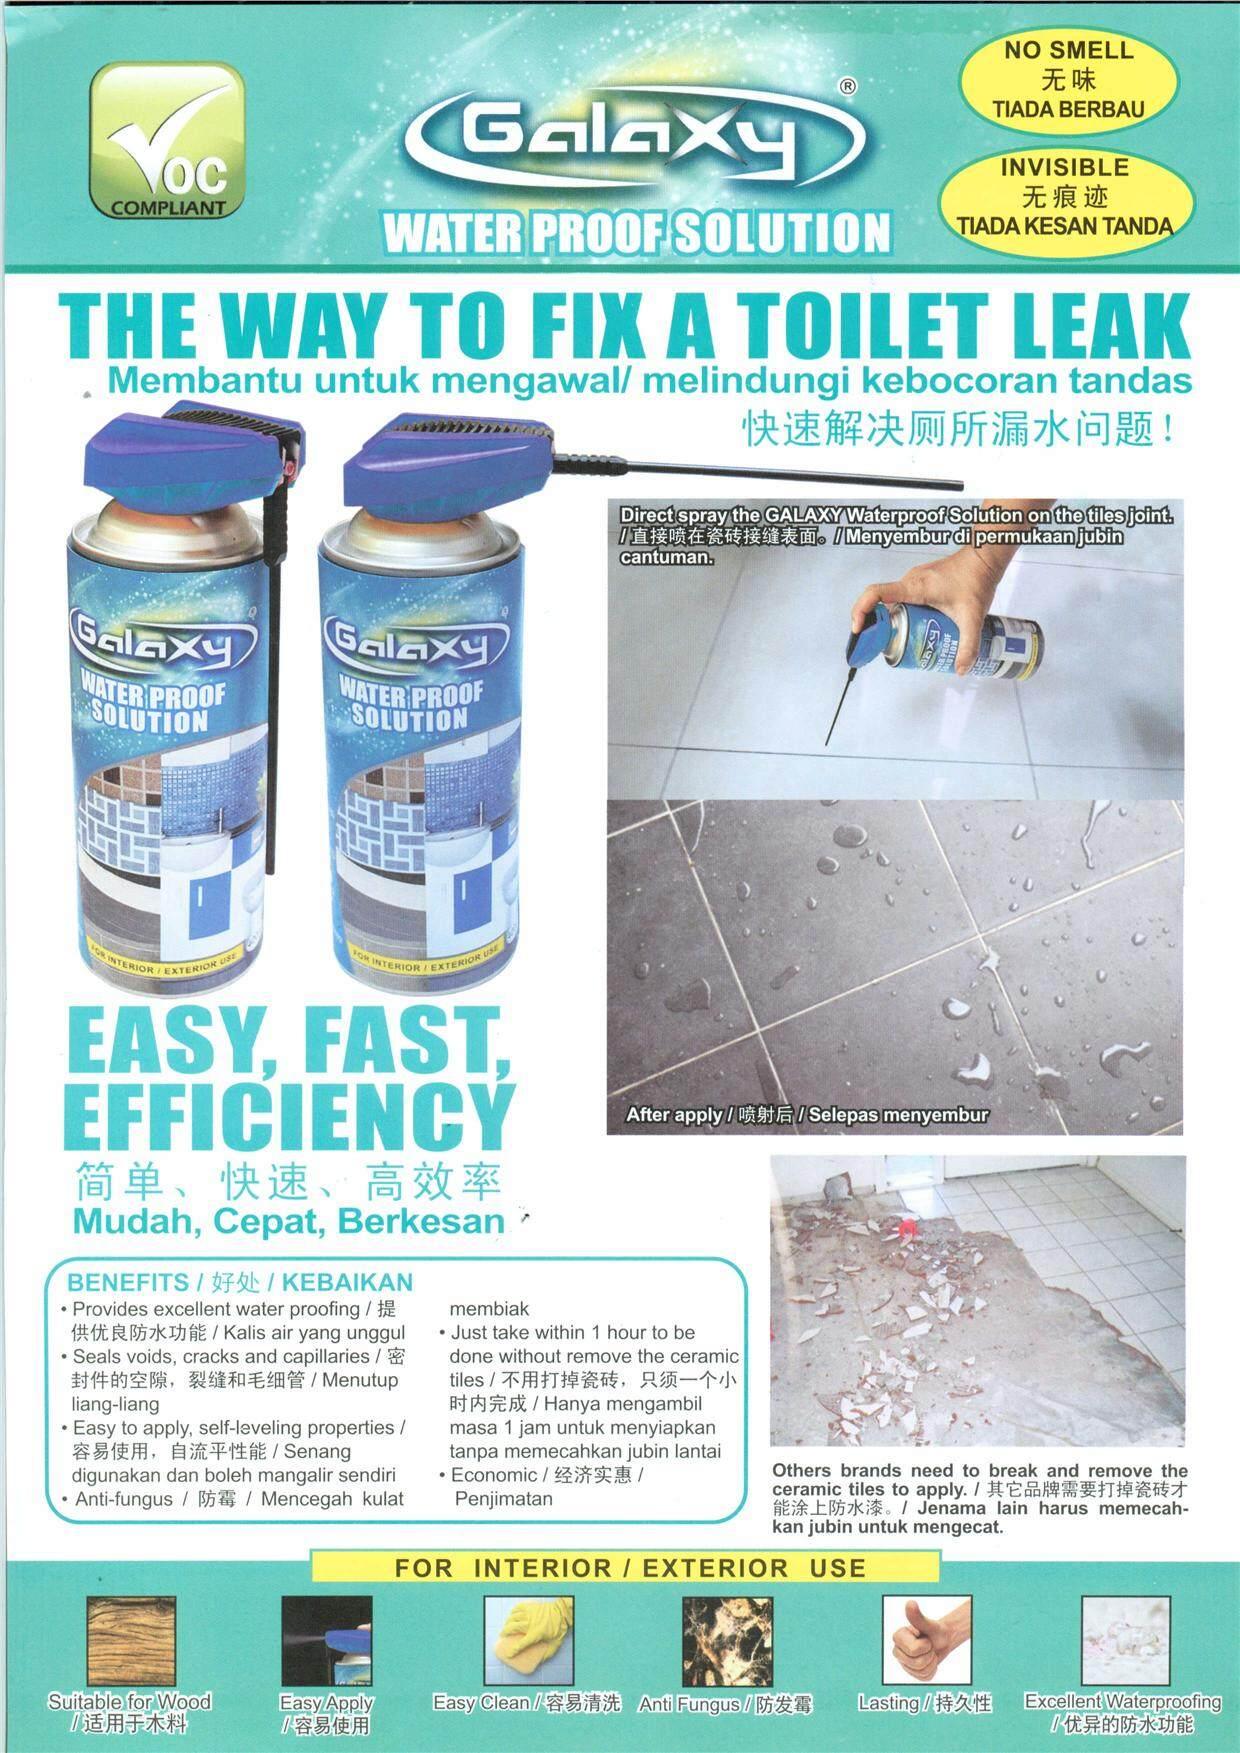 GALAXY 400ML Water Proof Spray Solution Toilet Leak Water Proof